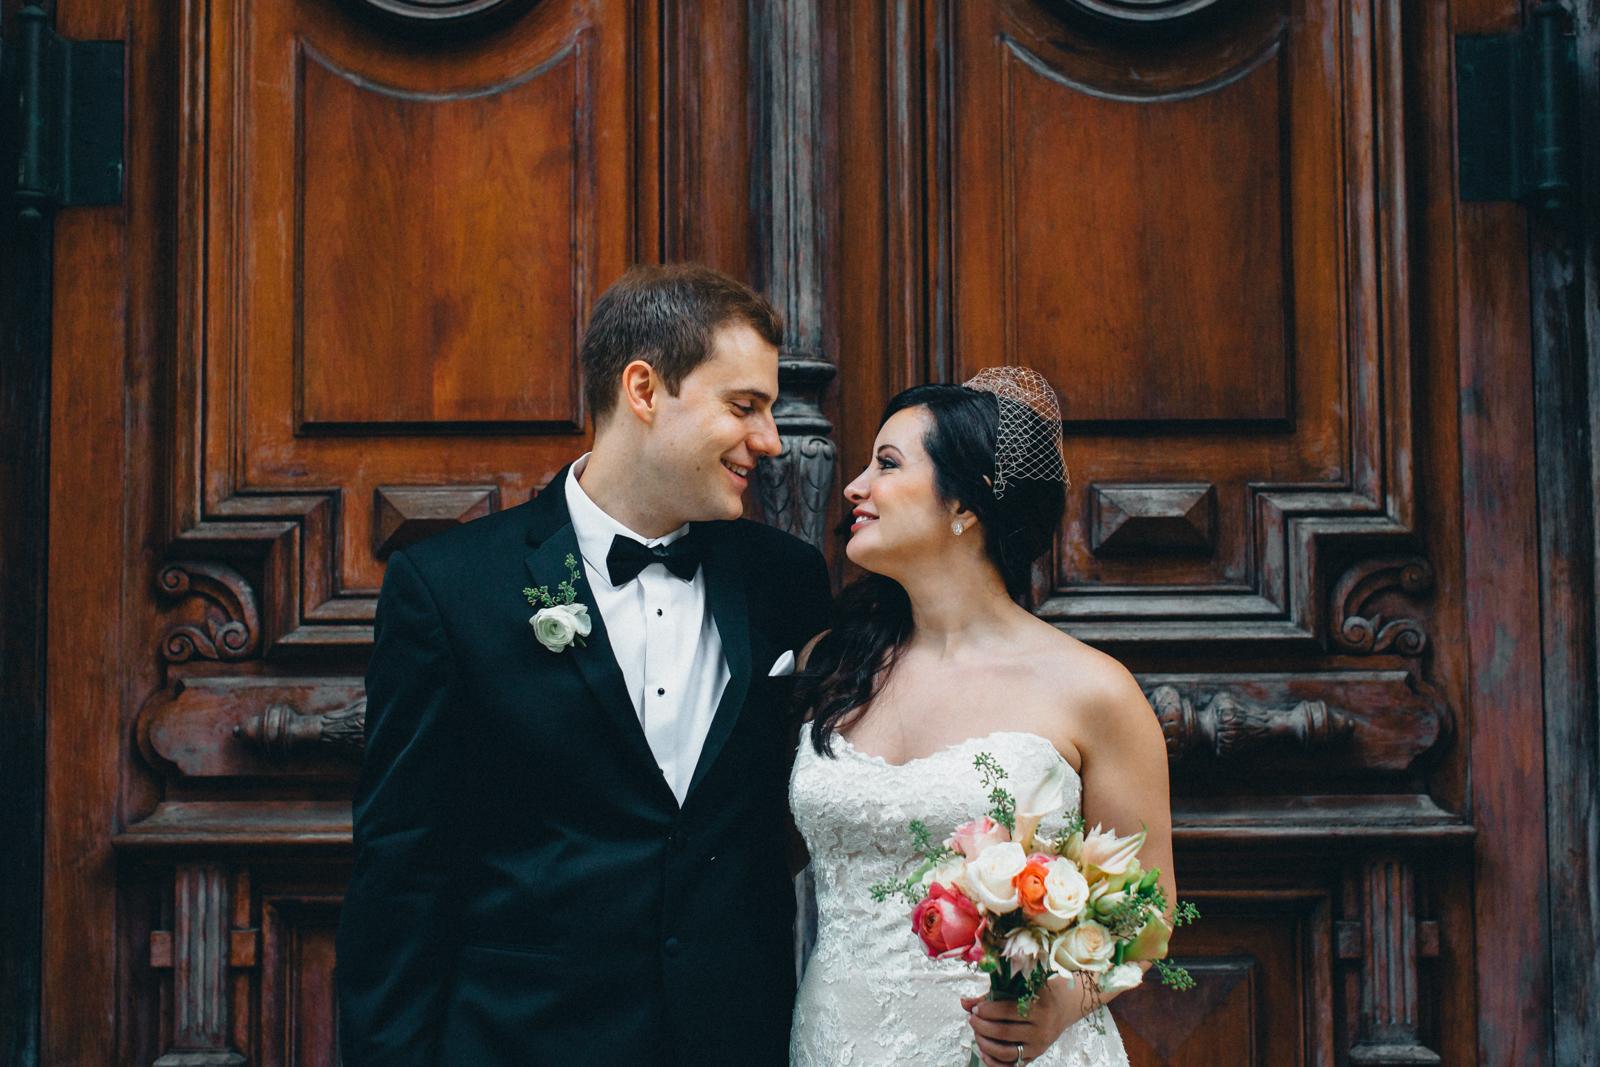 NYC Wedding Photography Lofts at Prince Brooklyn NYC Photographer Boris Zaretsky _B2C7988.jpg